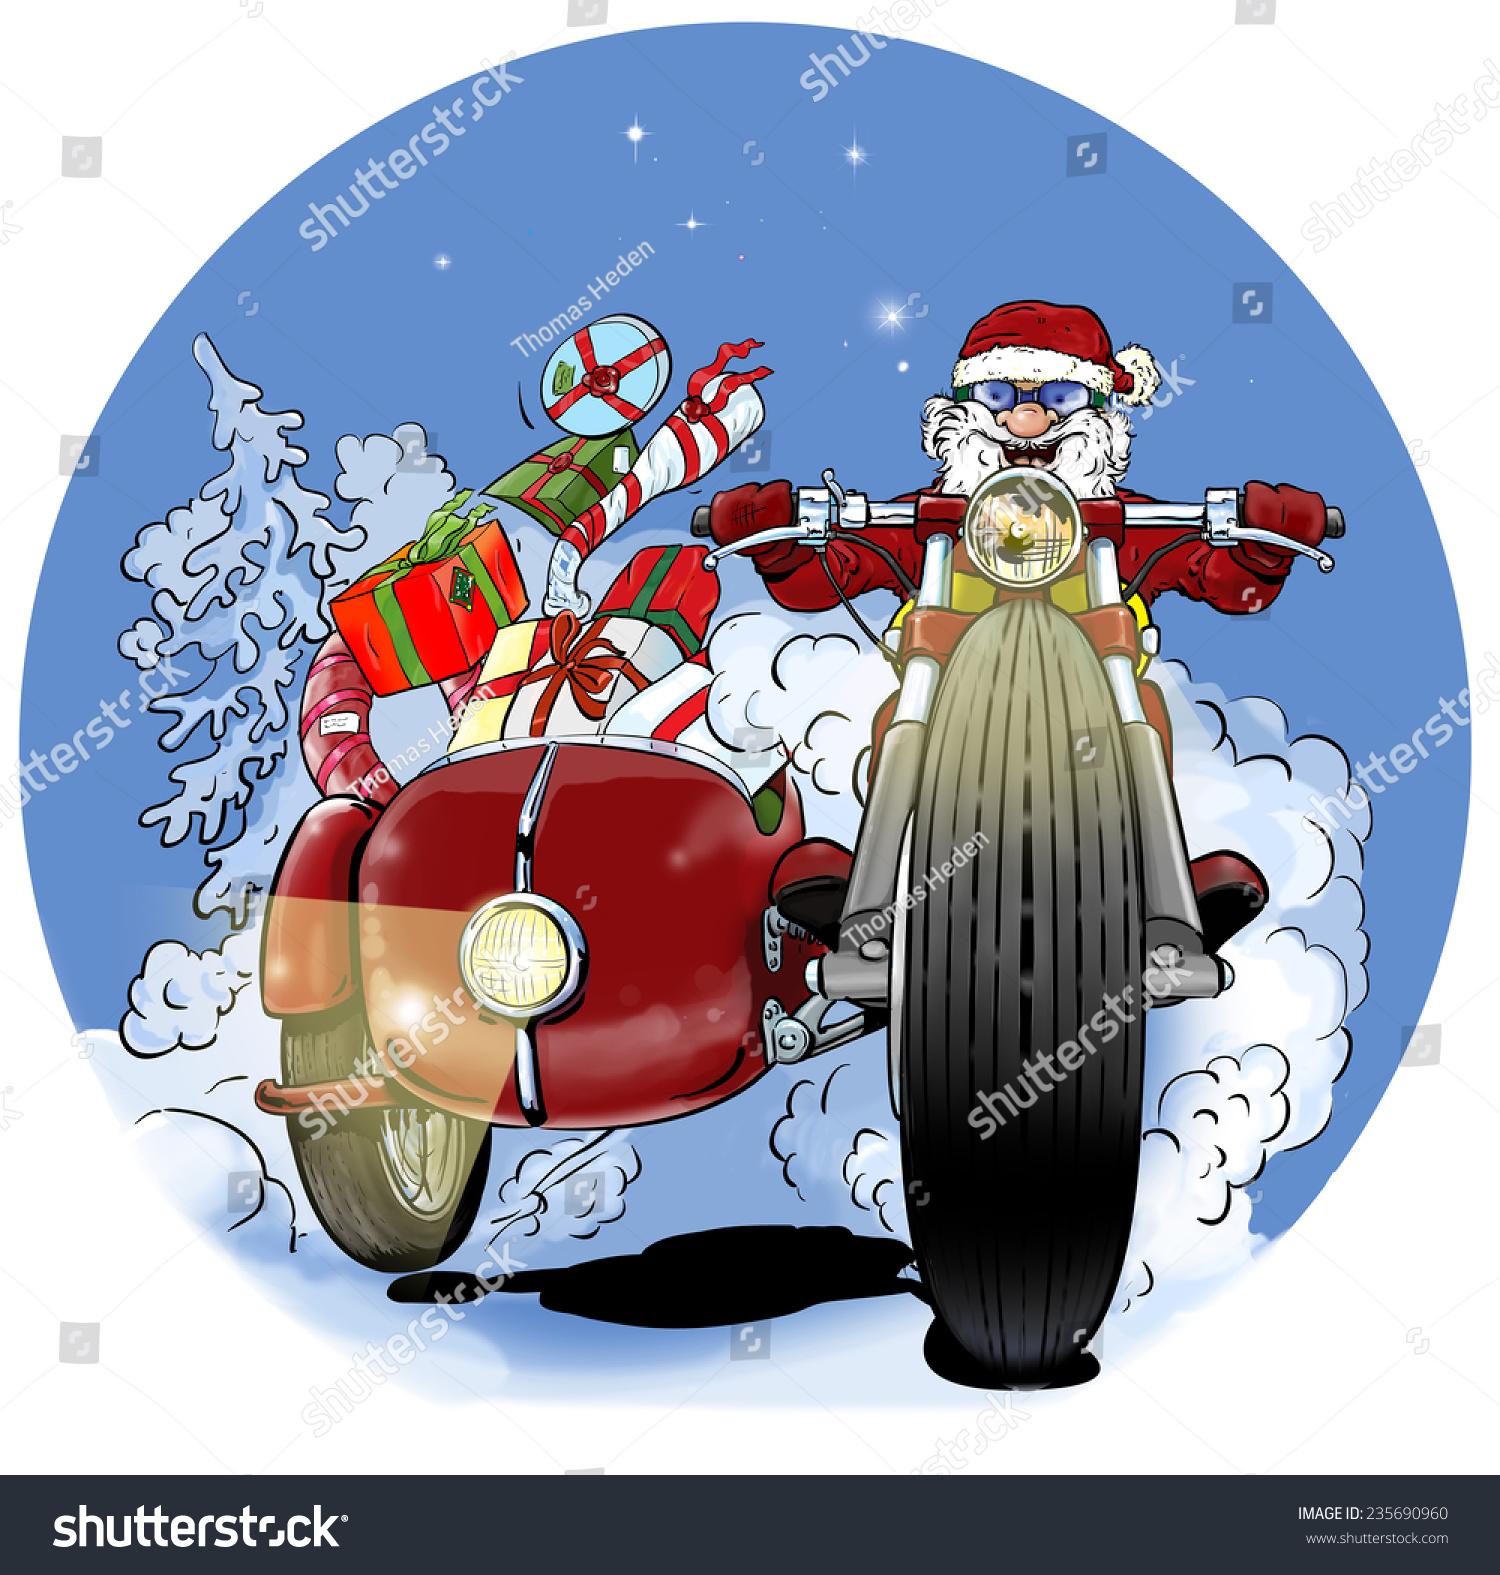 Santa Claus Biker Christmas Gifts Sidecar Stock Illustration ...